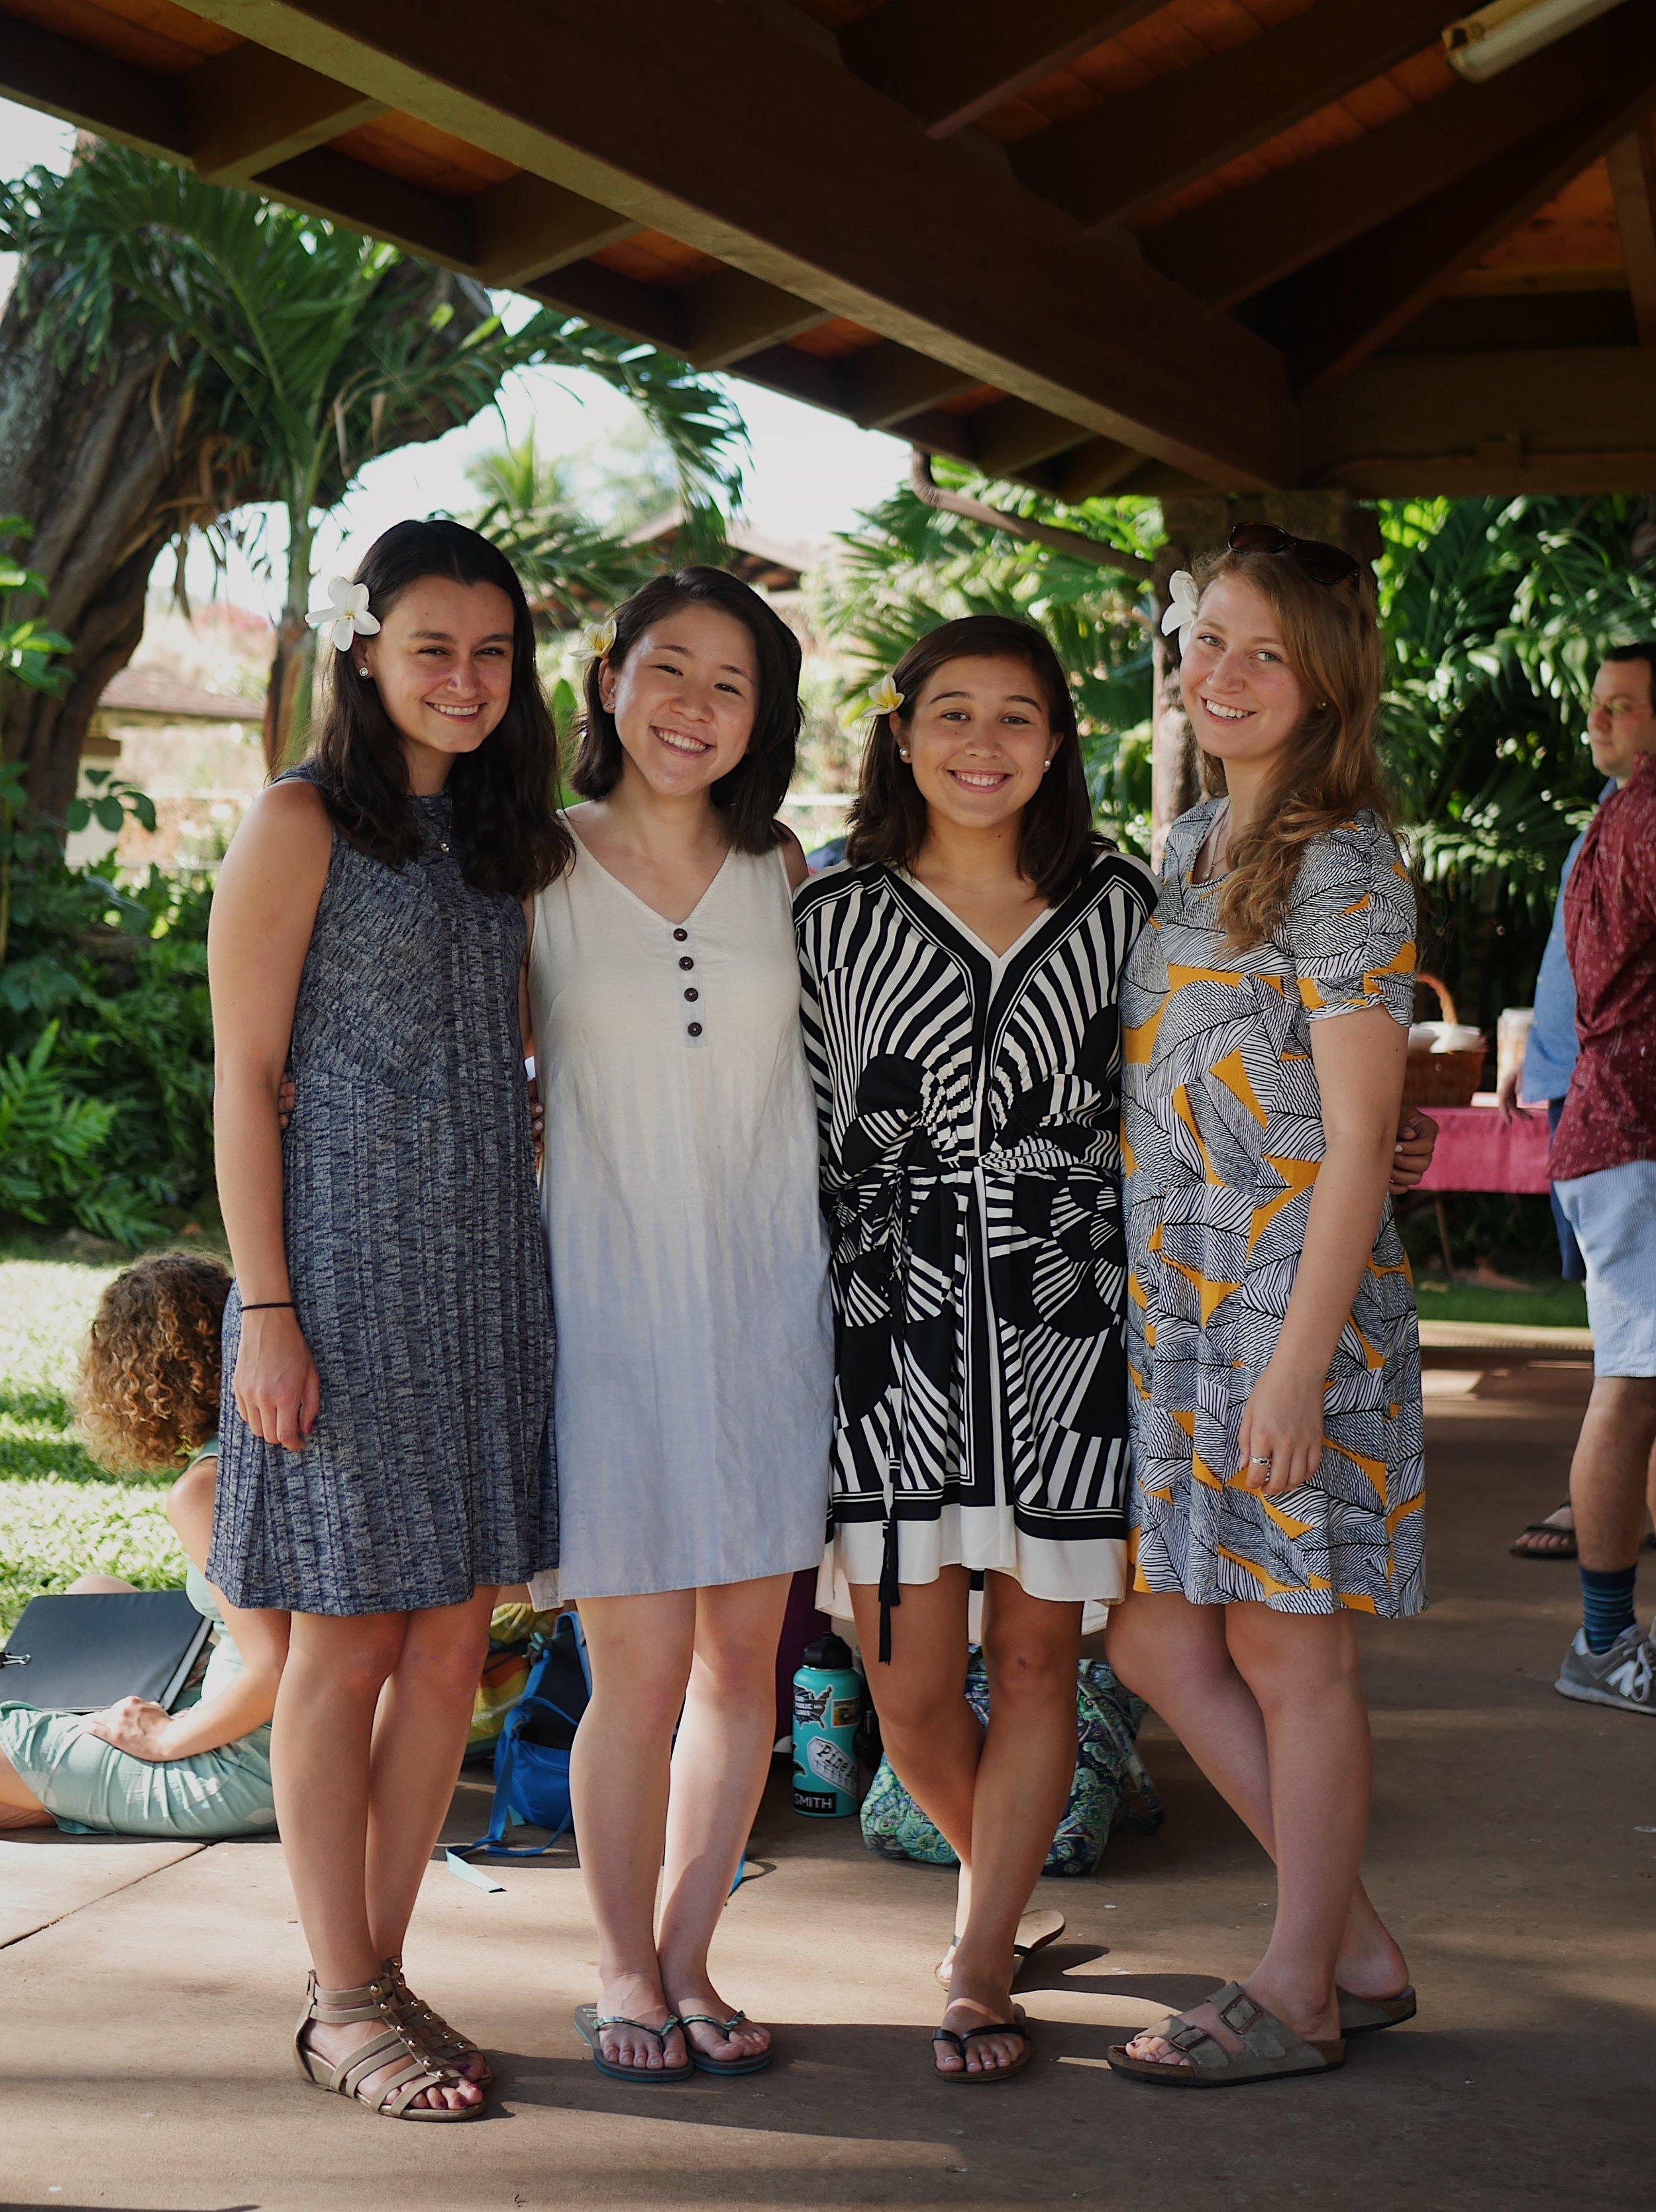 Michelle Carfagno, Stephany Kim, Izumi Matsuda, and Chiara Alvisi outside the Keawala'i Congregational Church